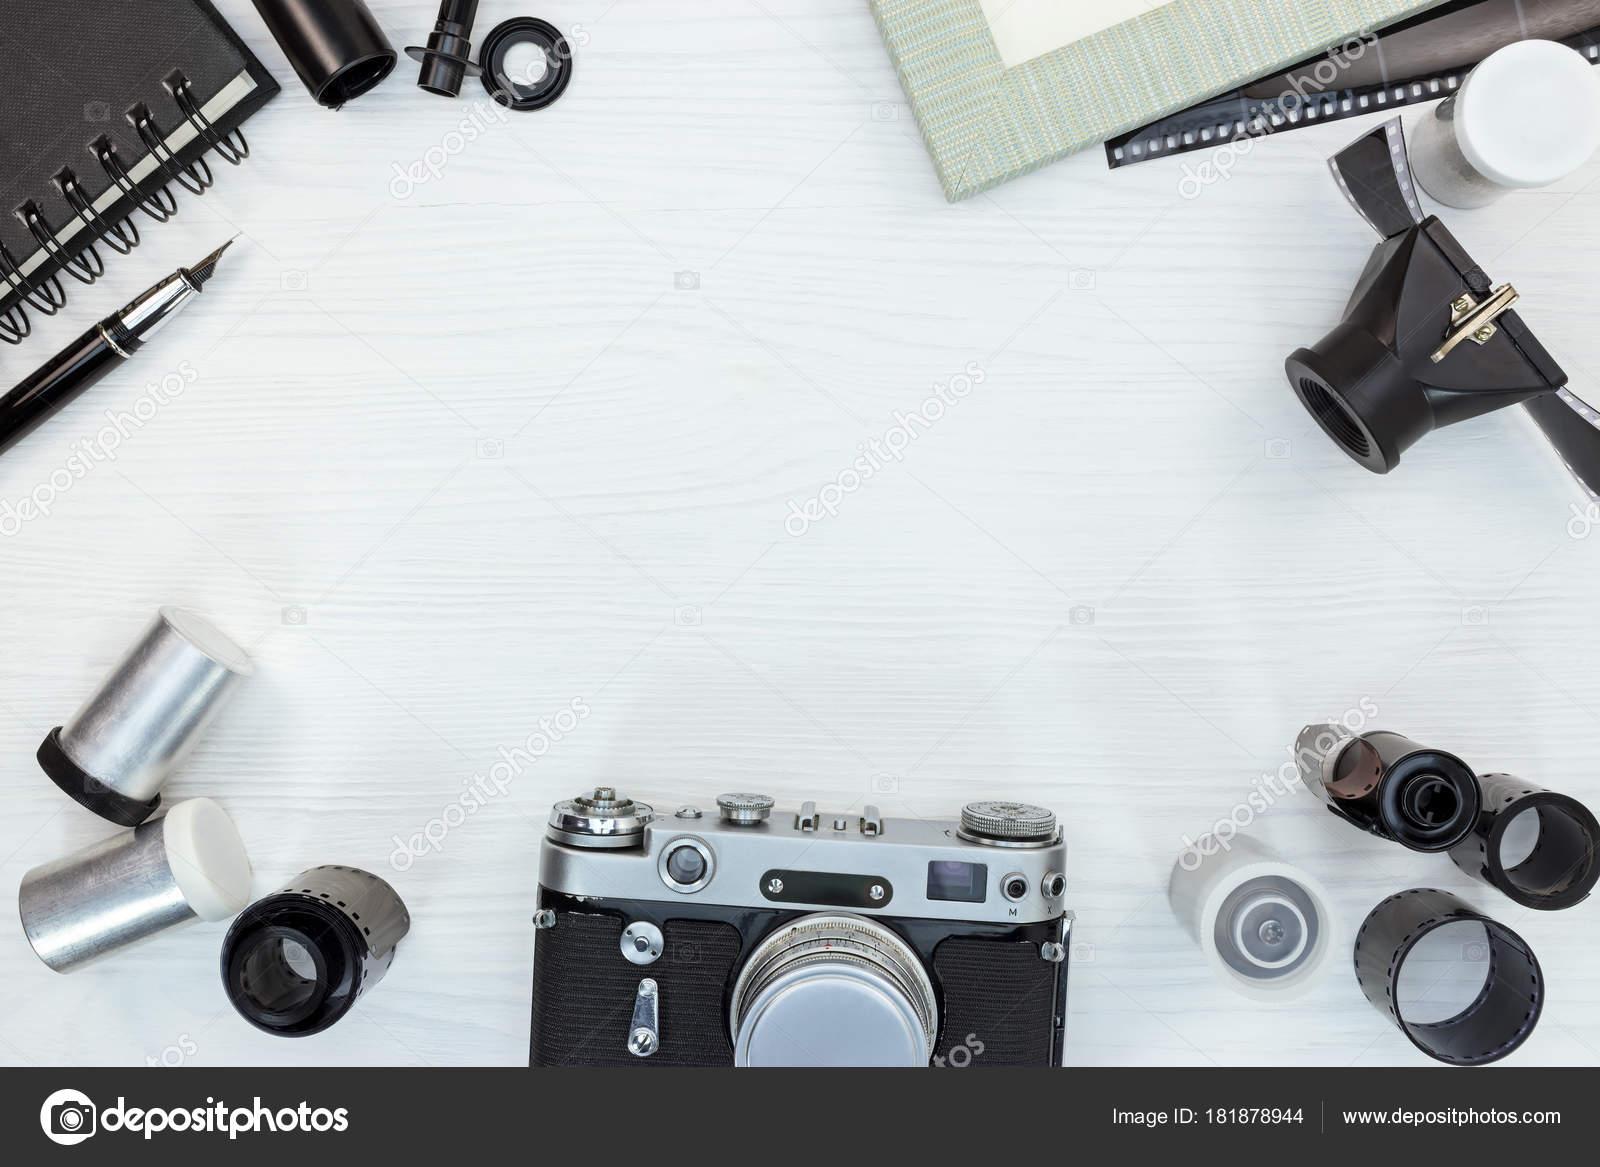 Retro-Kamera, Filmrollen, Objektiv, leere Bilderrahmen auf weißen ...